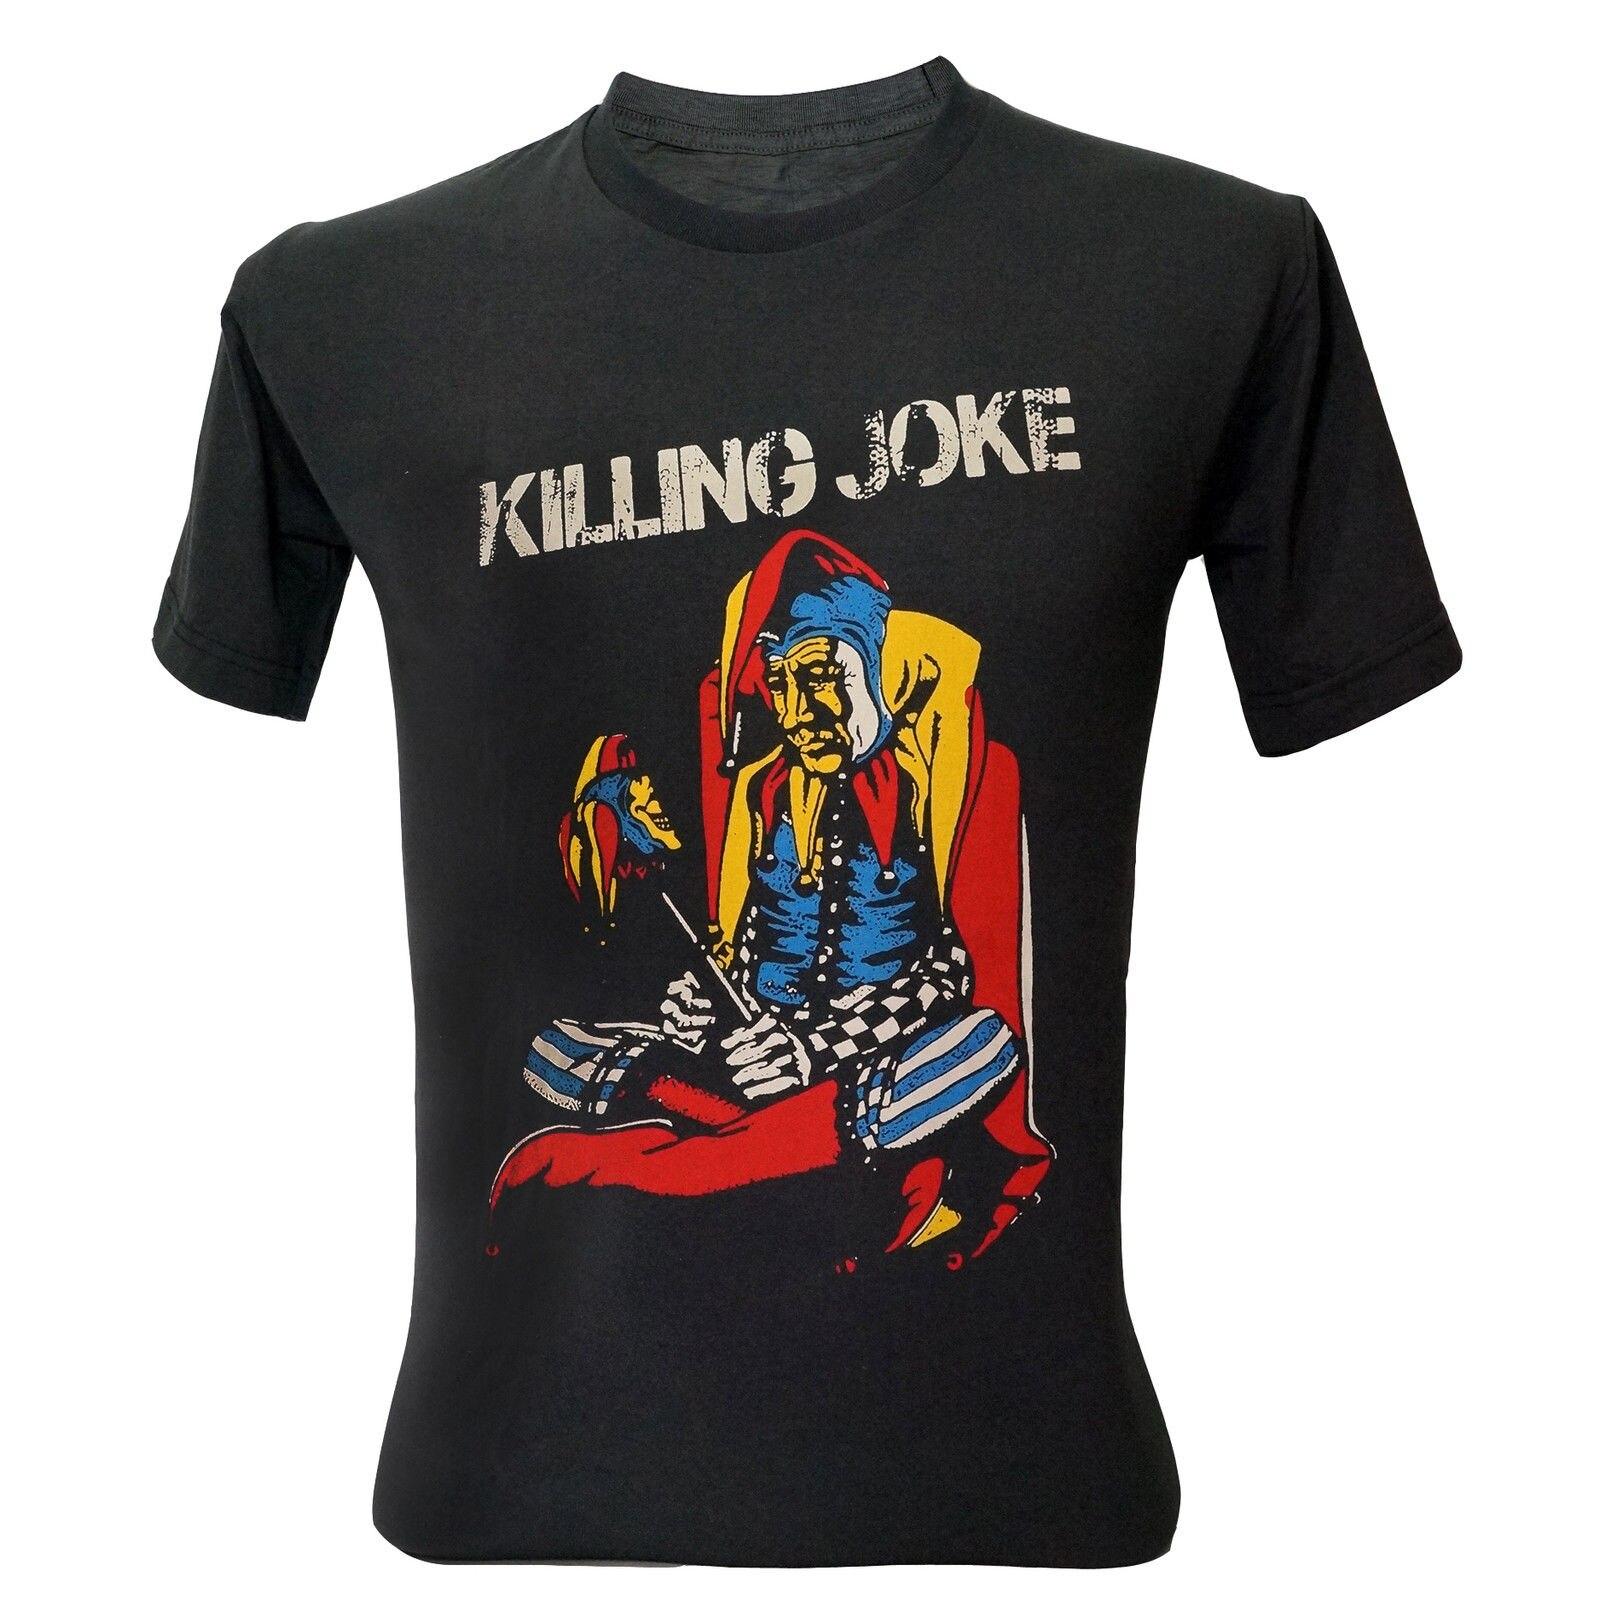 New KILLING JOKE Punk Rock Band Logo Mens White Black T-Shirt Size S To 3XL Men Adult T Shirt Short Sleeve Cotton Top Tee